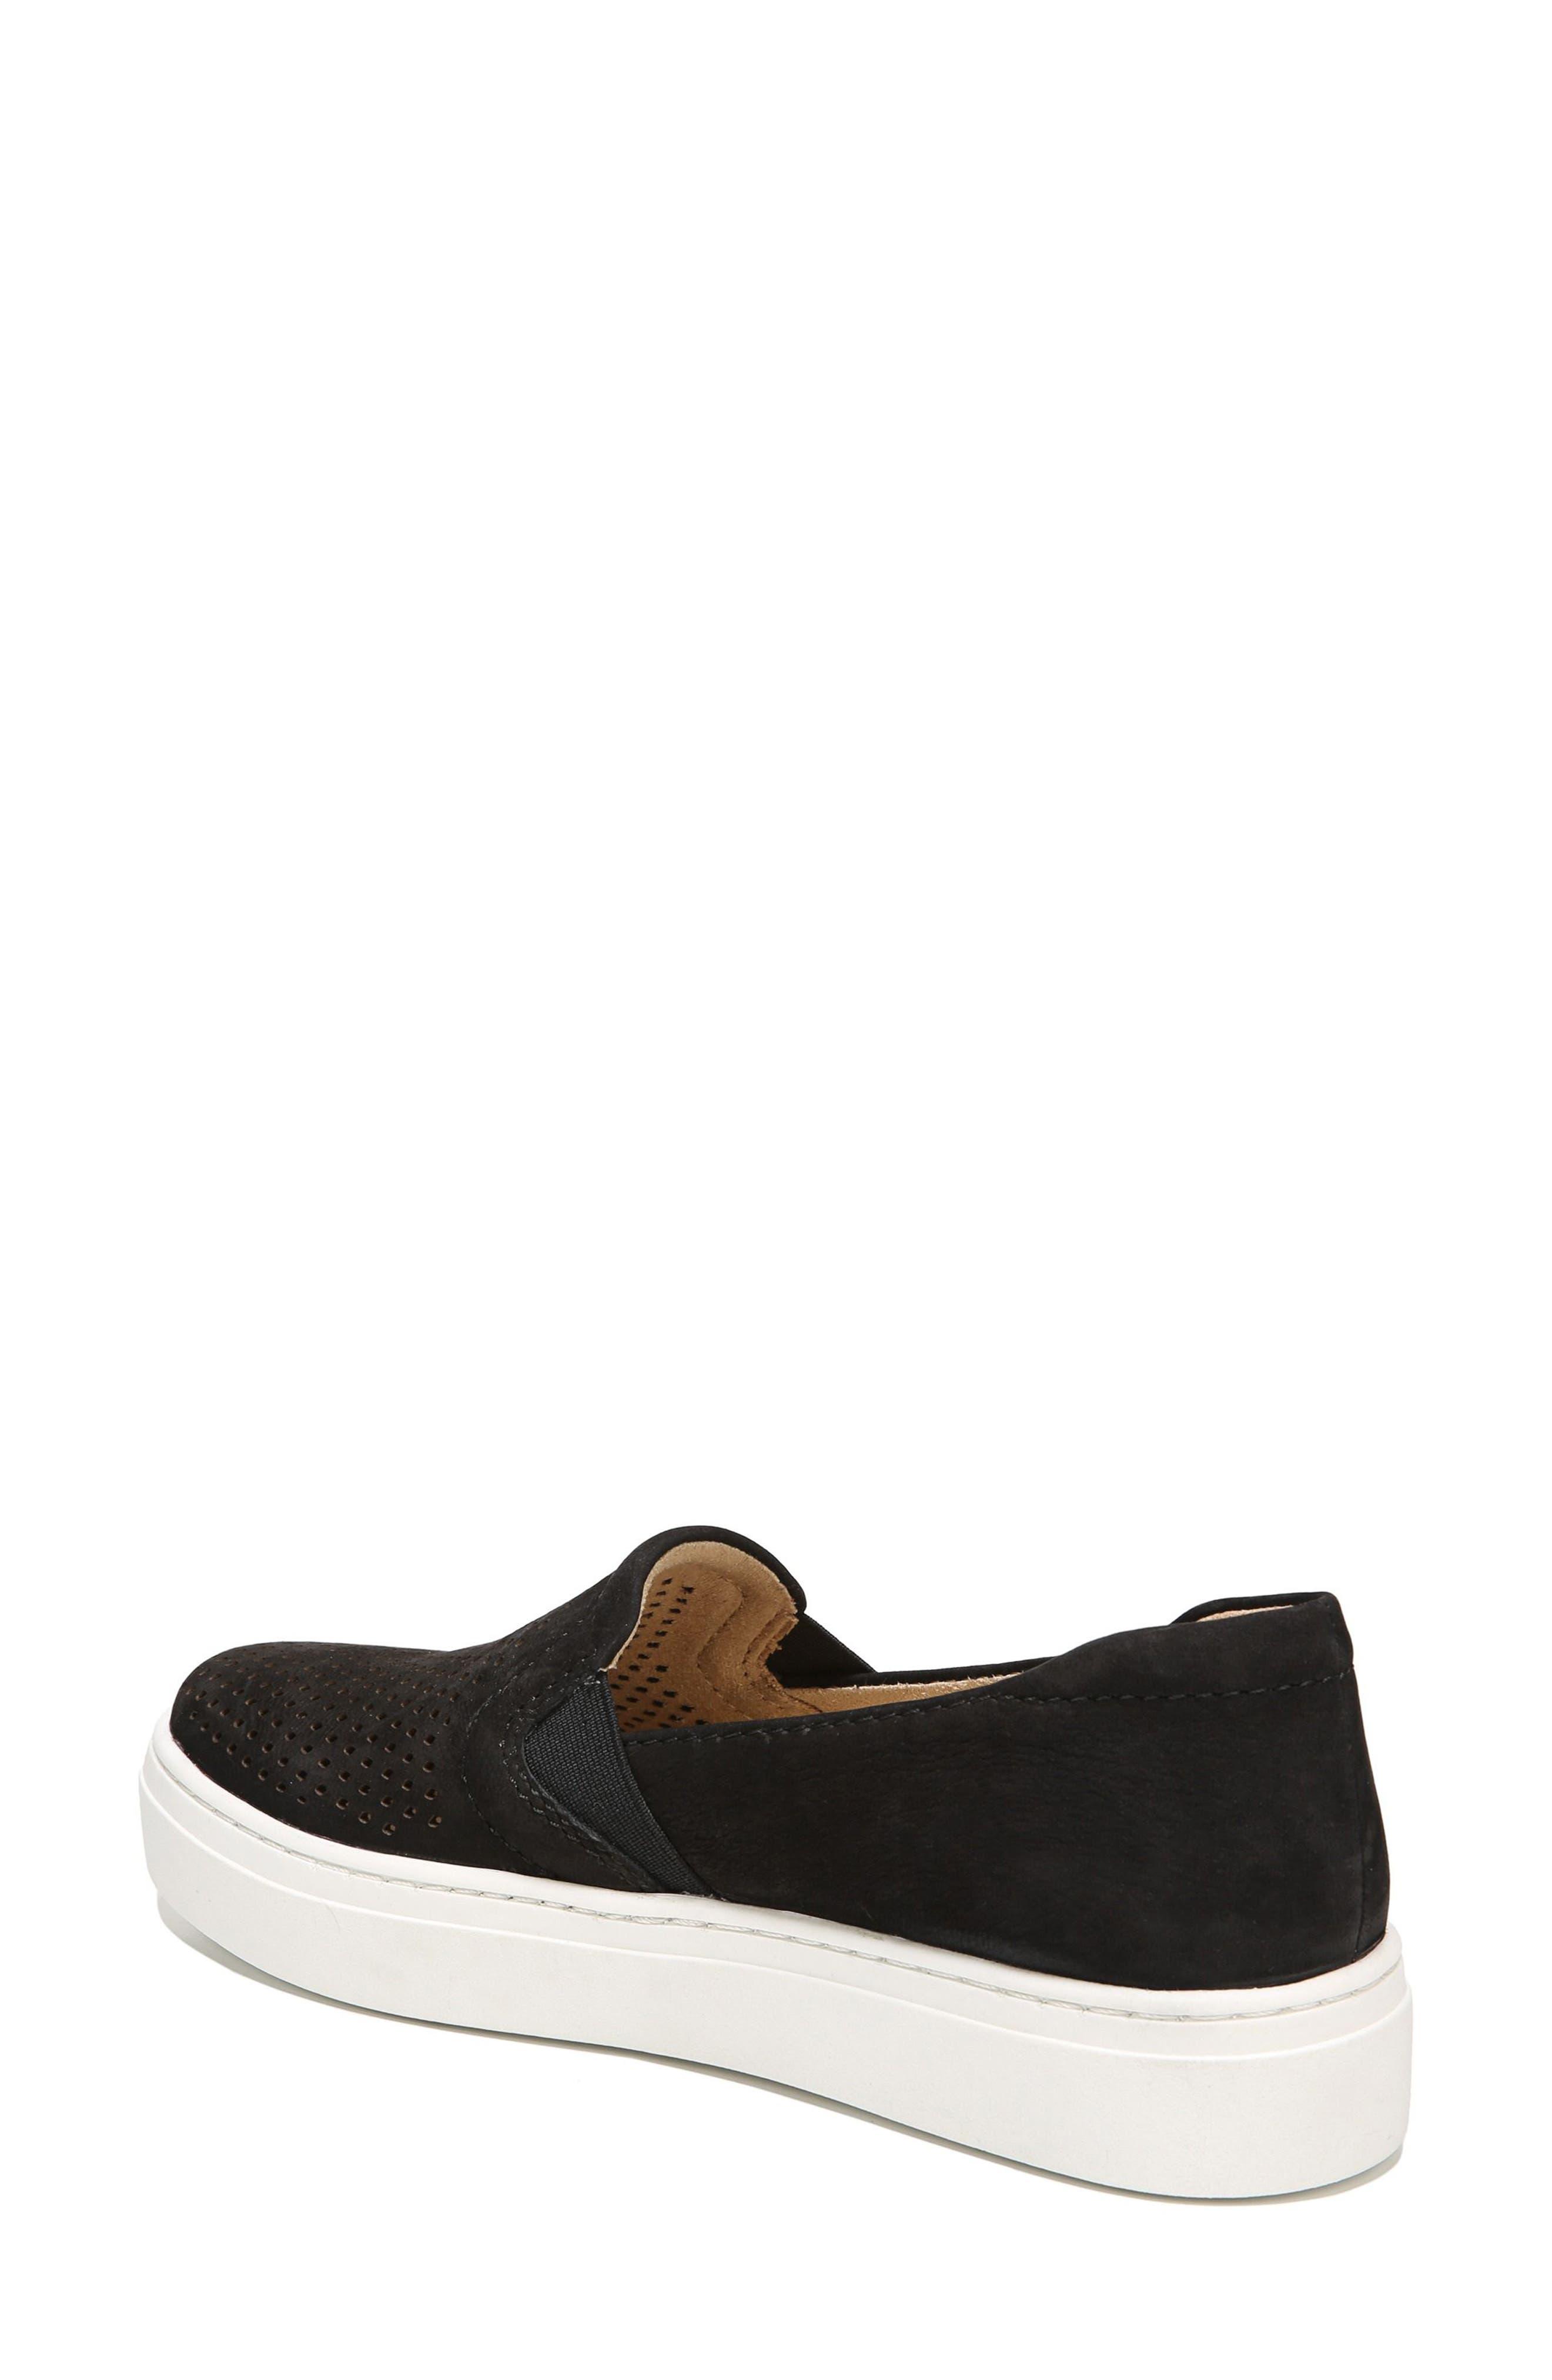 Alternate Image 2  - Naturalizer Carly Slip-On Sneaker (Women)